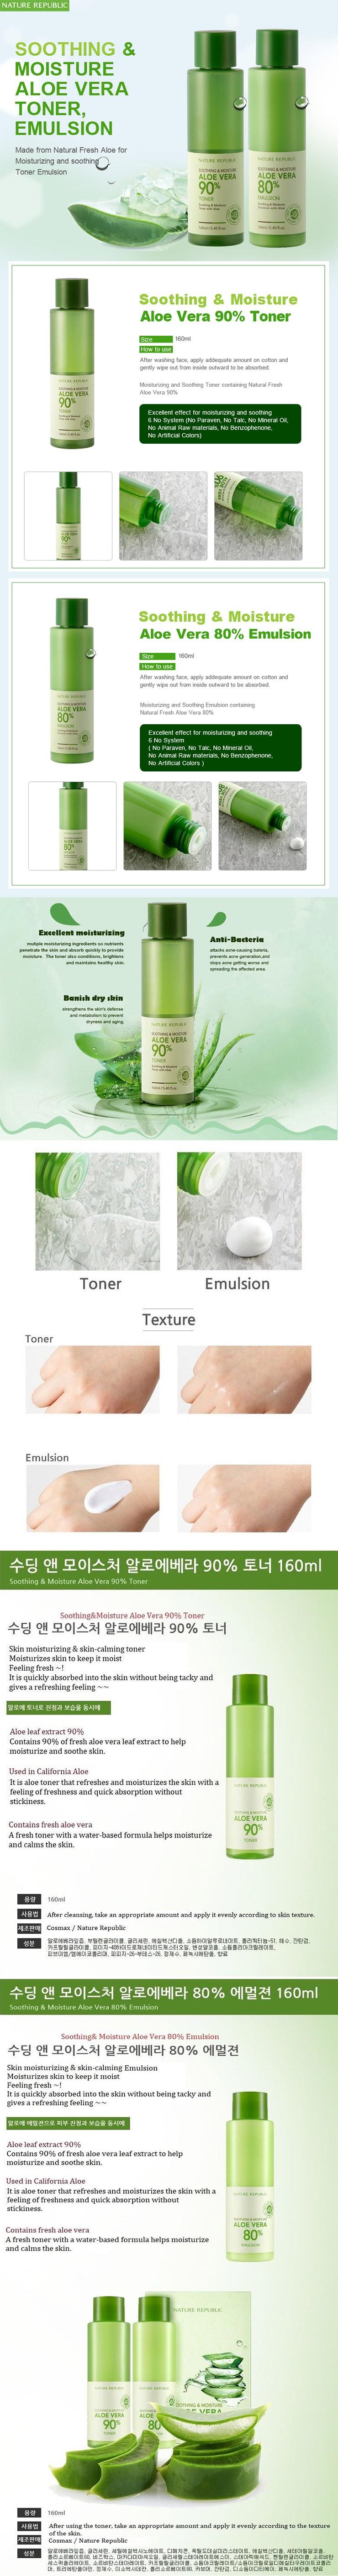 Moisture Aloe Vera Toner & Emulsion Set [Nature Republic]